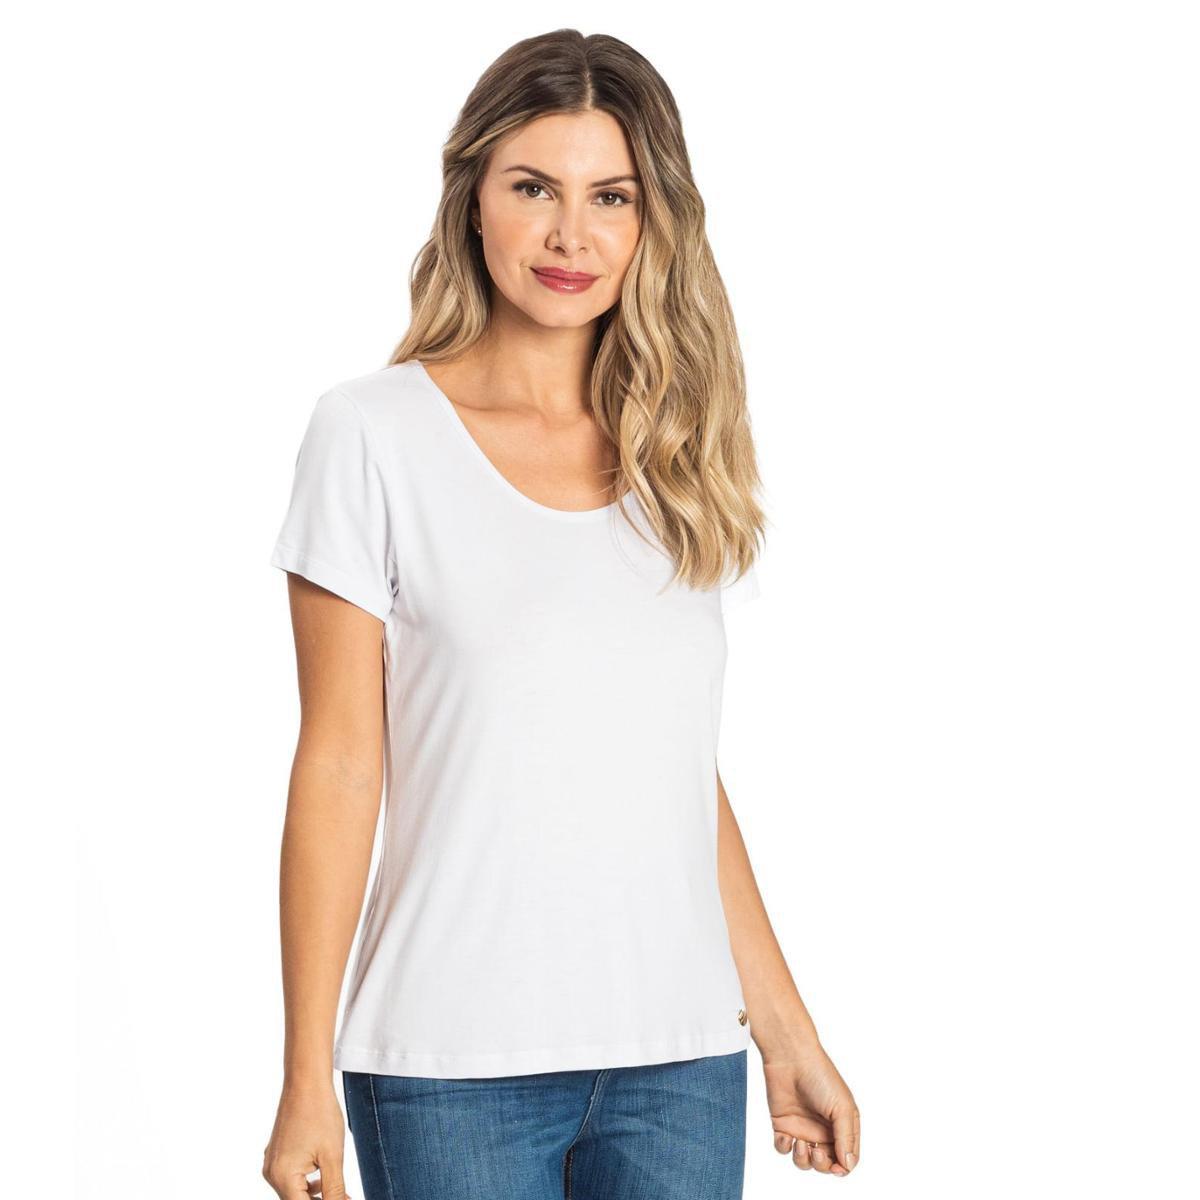 Blusa Feminina Viscotorcion Básica Rovitex - Branco